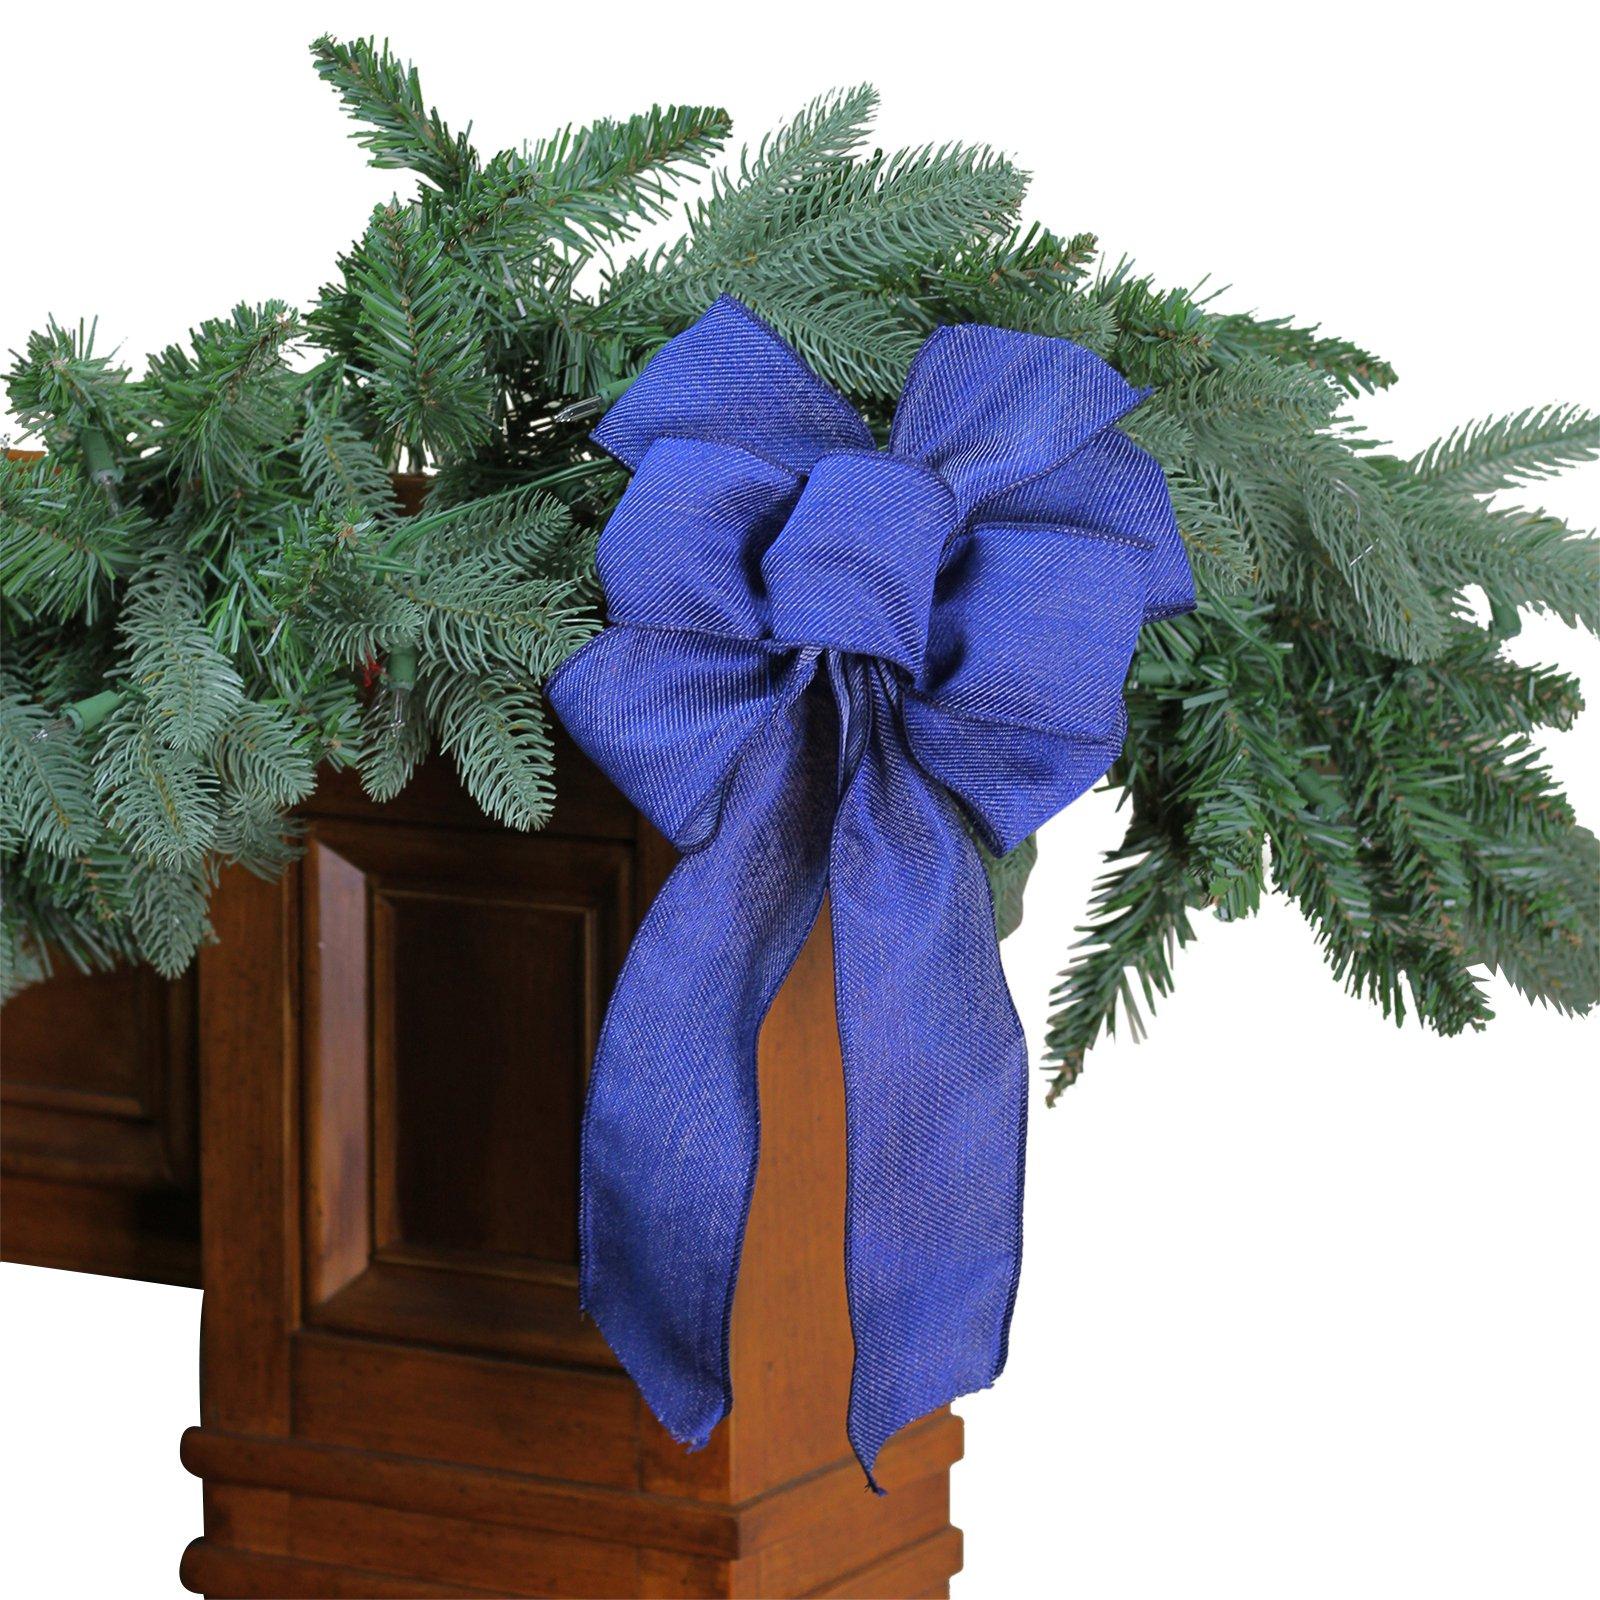 Northlight 6 Loop Denim Christmas Bow Decoration